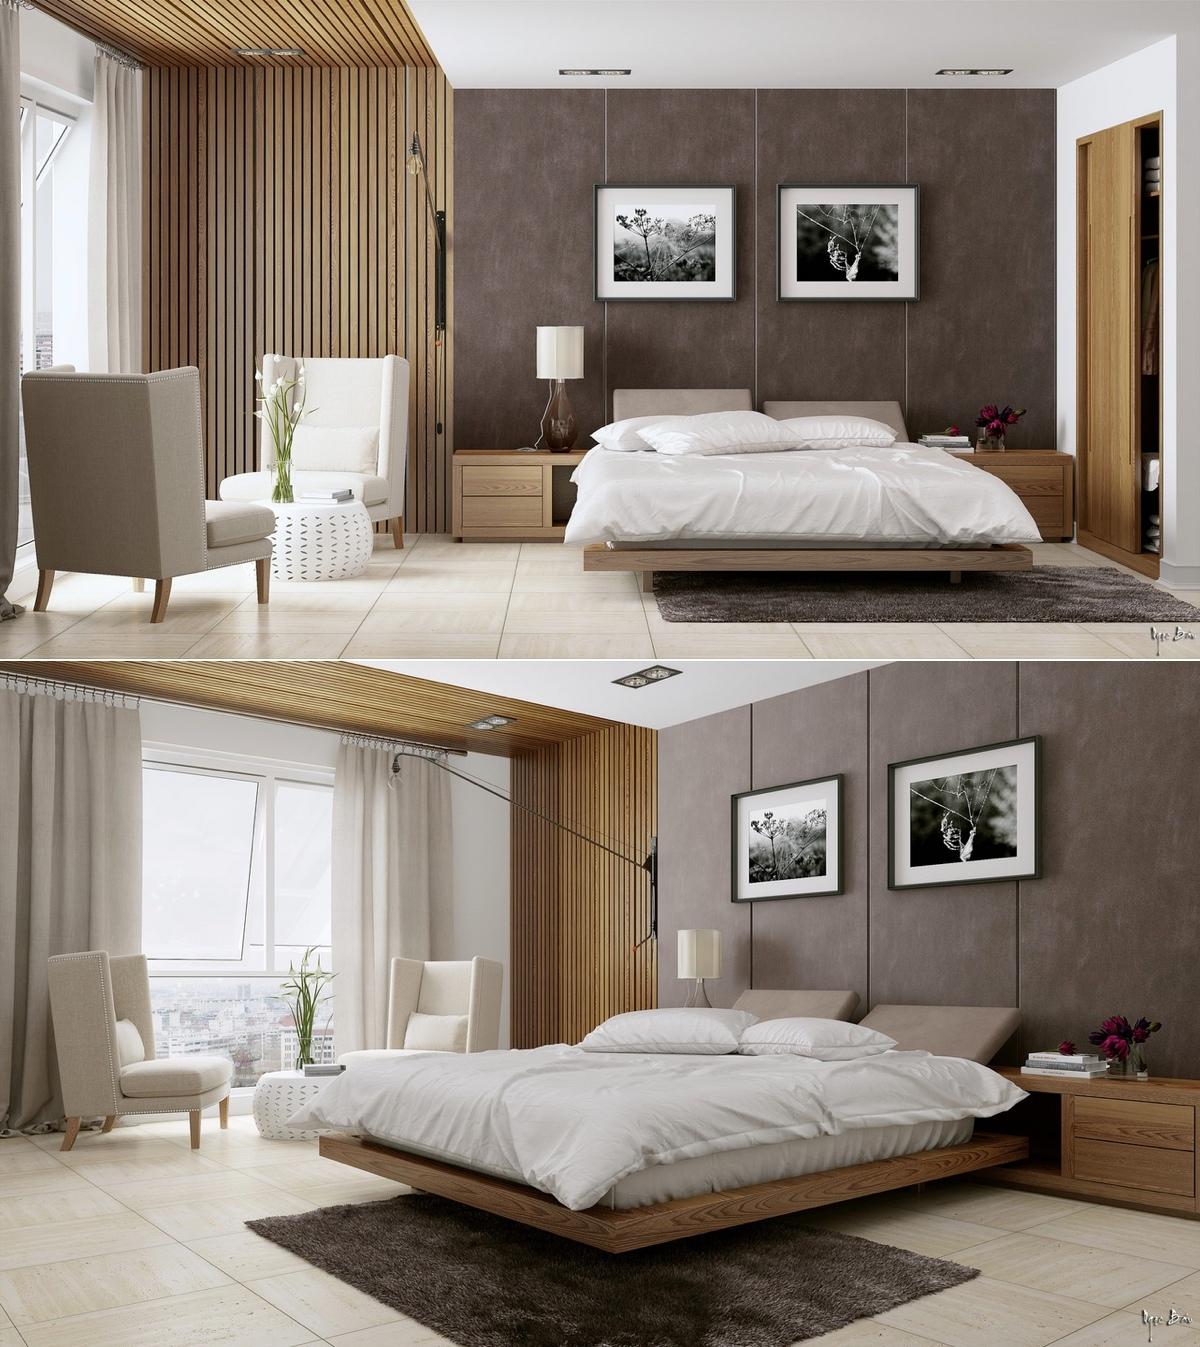 %name كيف تختارين السرير المثالي لنوم هانئ وأحلام سعيدة